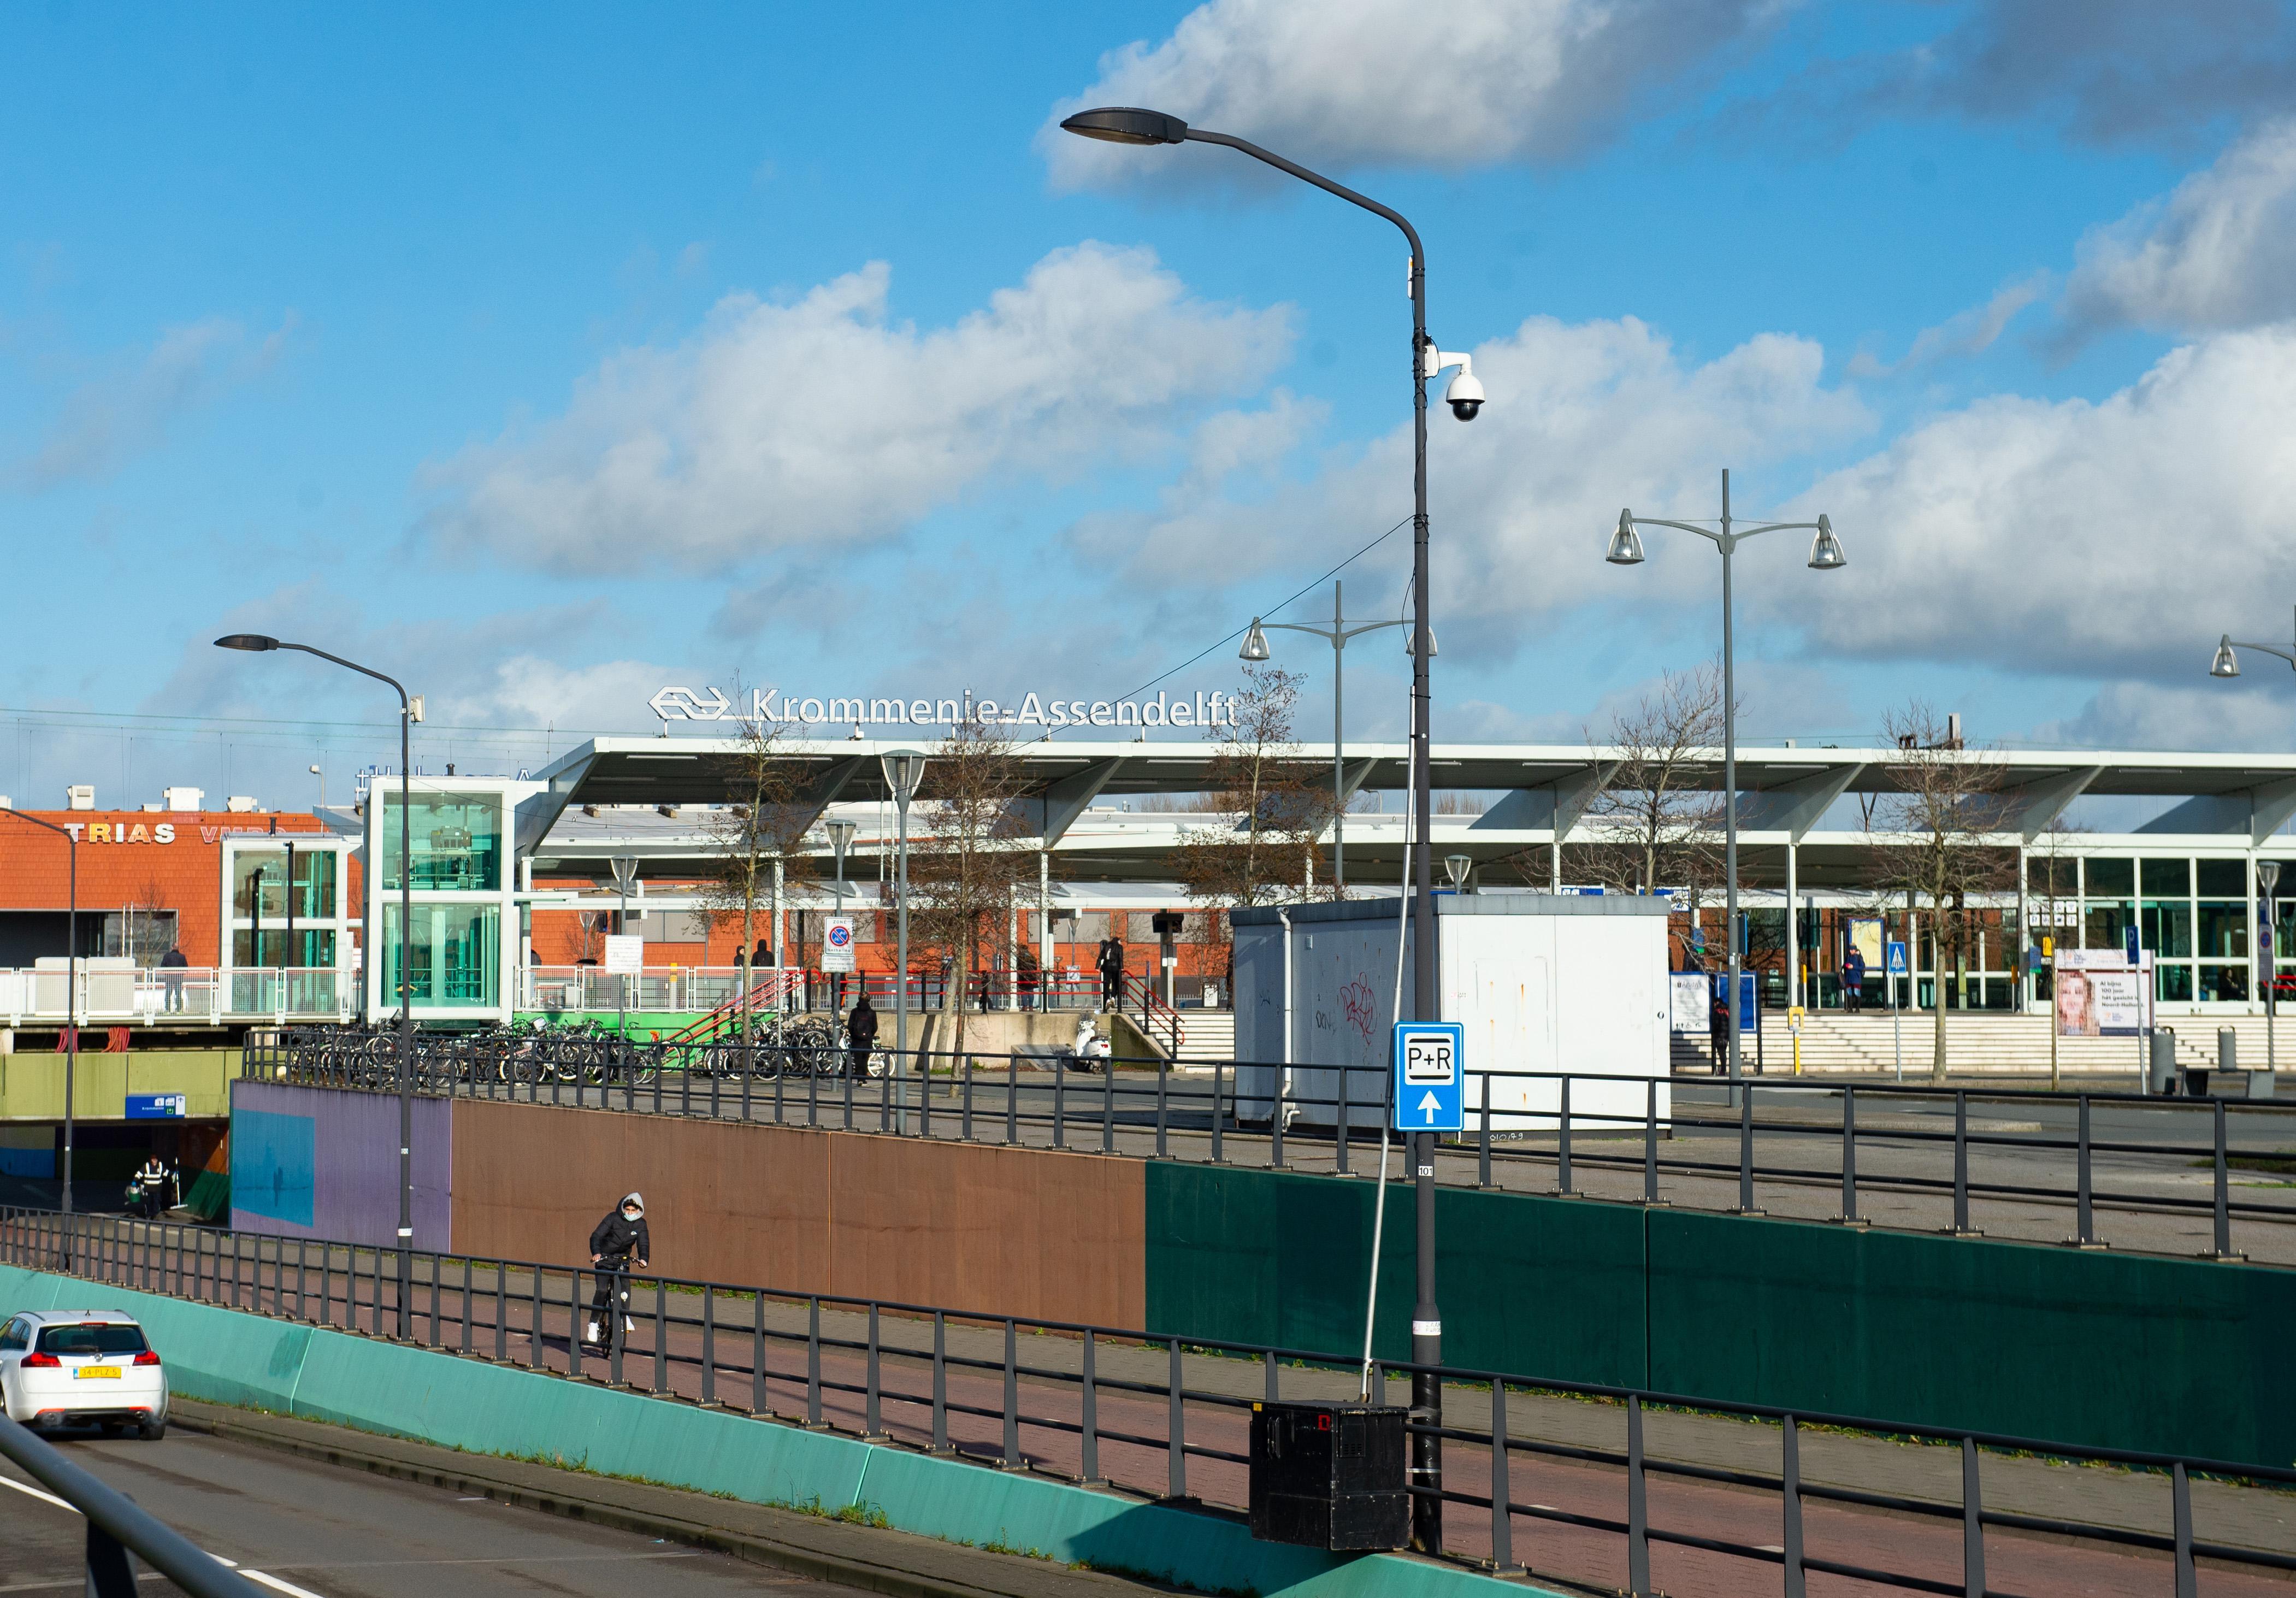 Station Krommenie-Assendelft krijgt permanent cameratoezicht, net als Zaandam. Andere vier stations niet